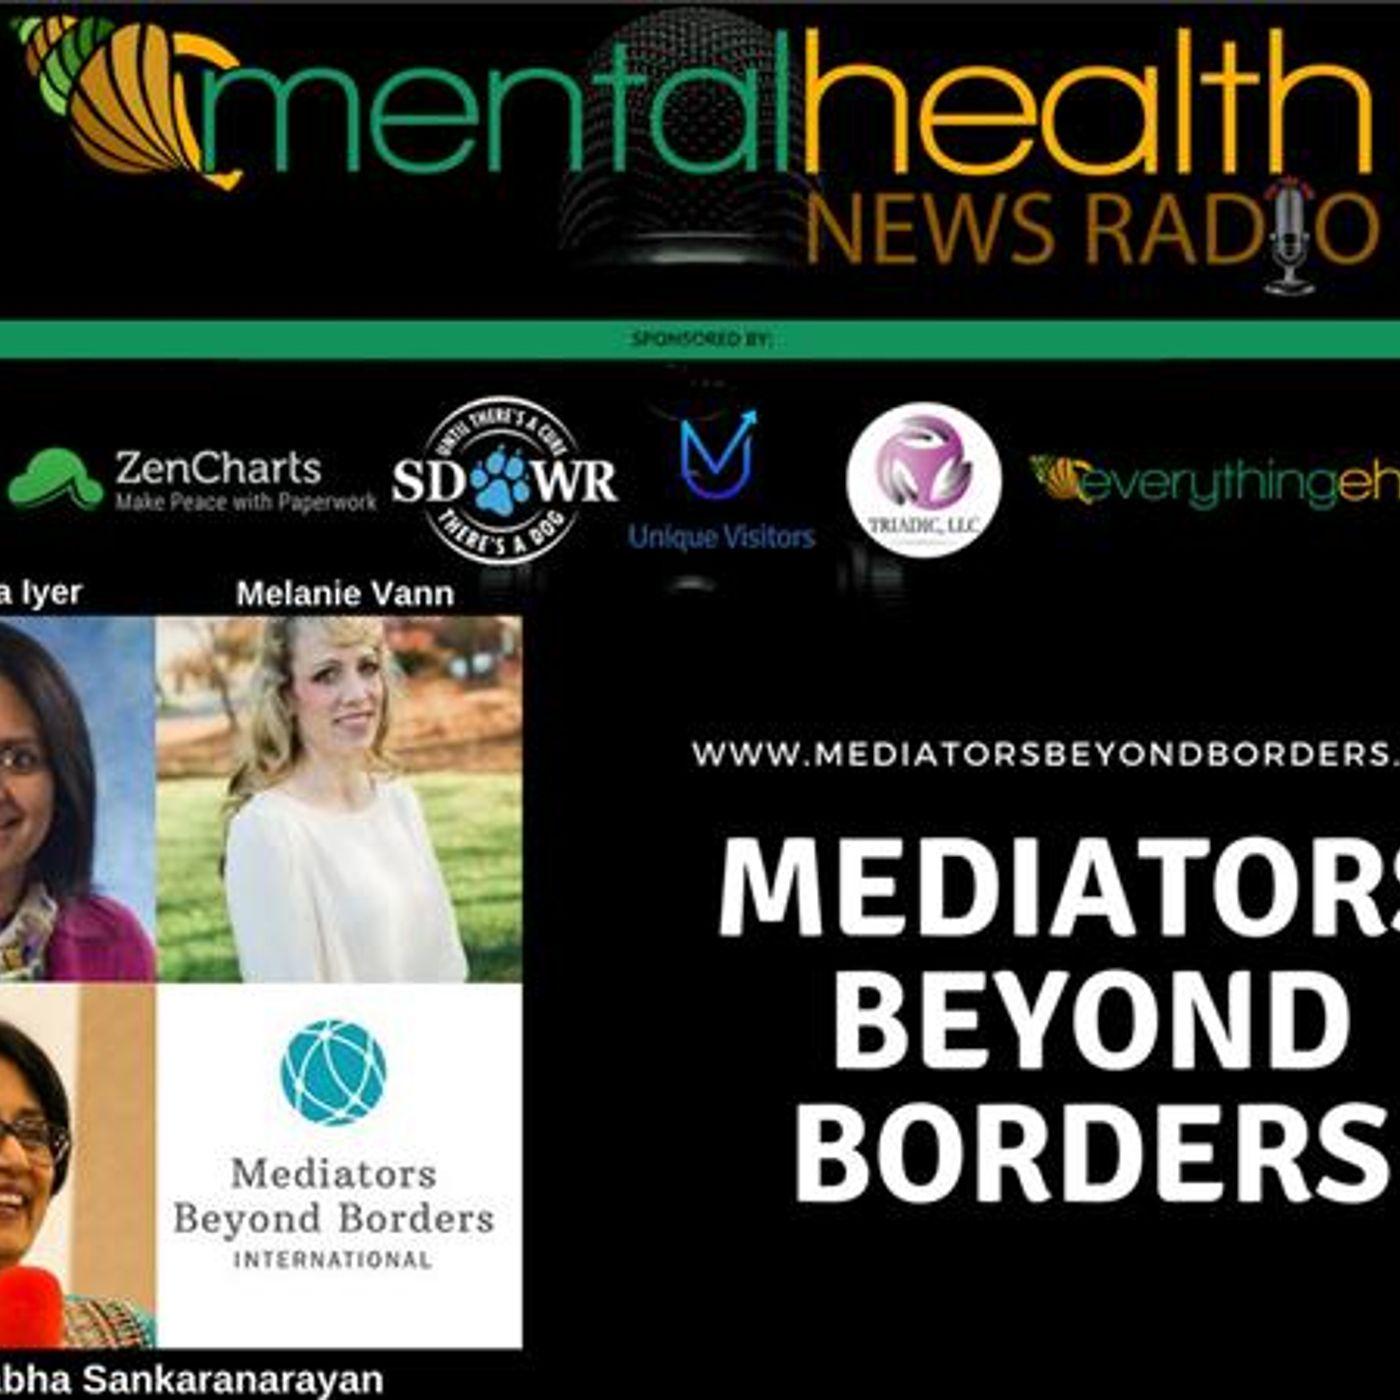 Mental Health News Radio - Mediators Beyond Borders: President and CEO Prabha Sankaranarayan